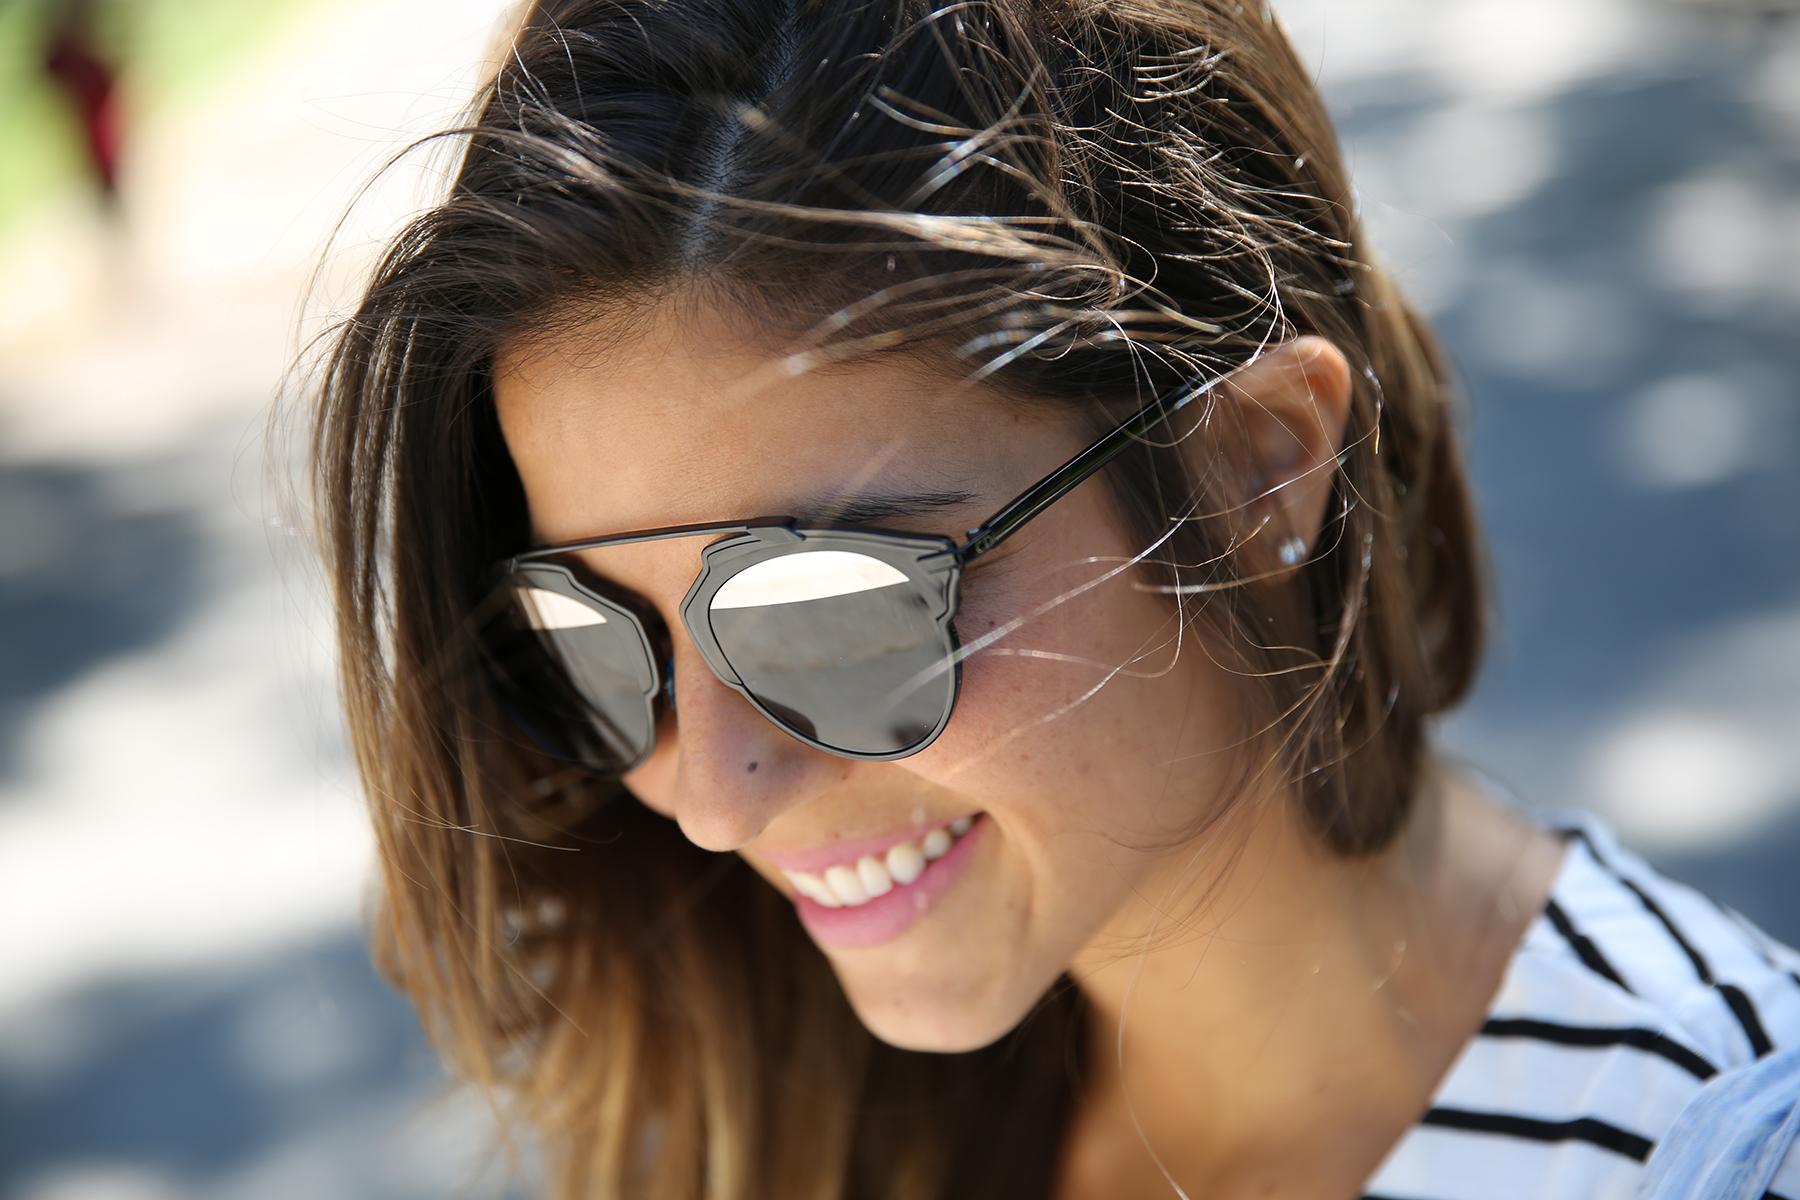 trendy_taste-look-outfit-street_style-ootd-blog-blogger-fashion_spain-vaquero_claro-peto_vaquero-tirantes-striped_tee-camiseta_rayas-marinero-dior_sunnies-gaimo-8